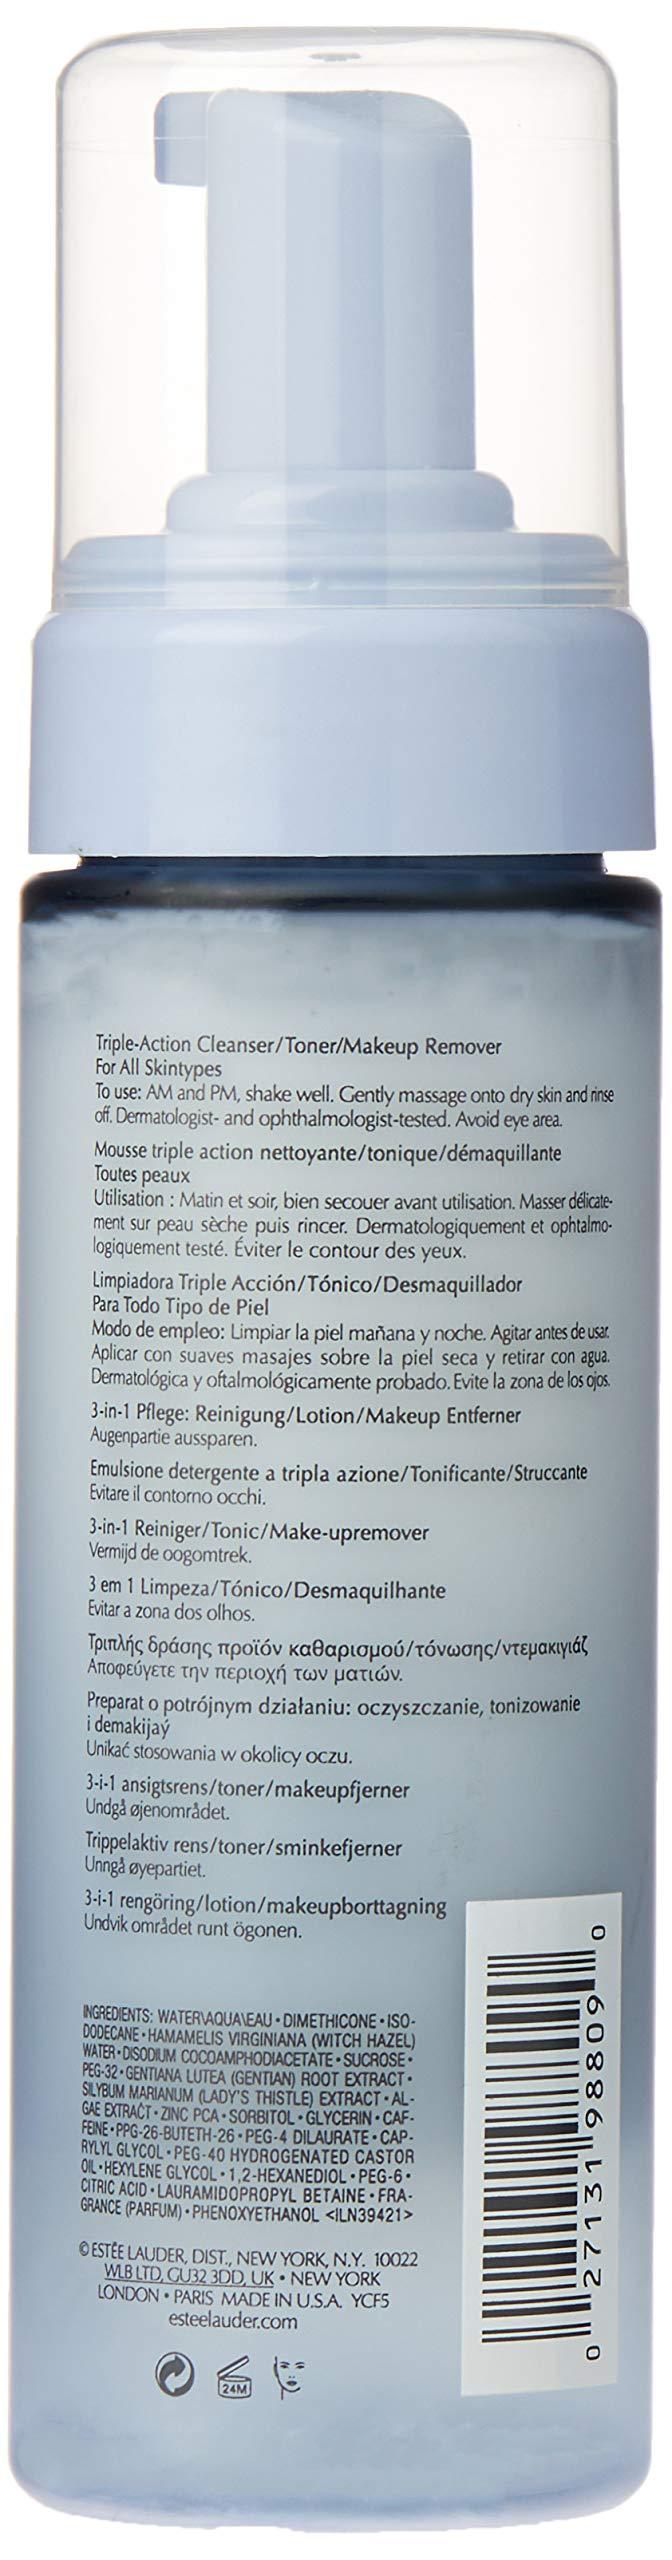 Estee Lauder 53384 – Desmaquillante 150 ml